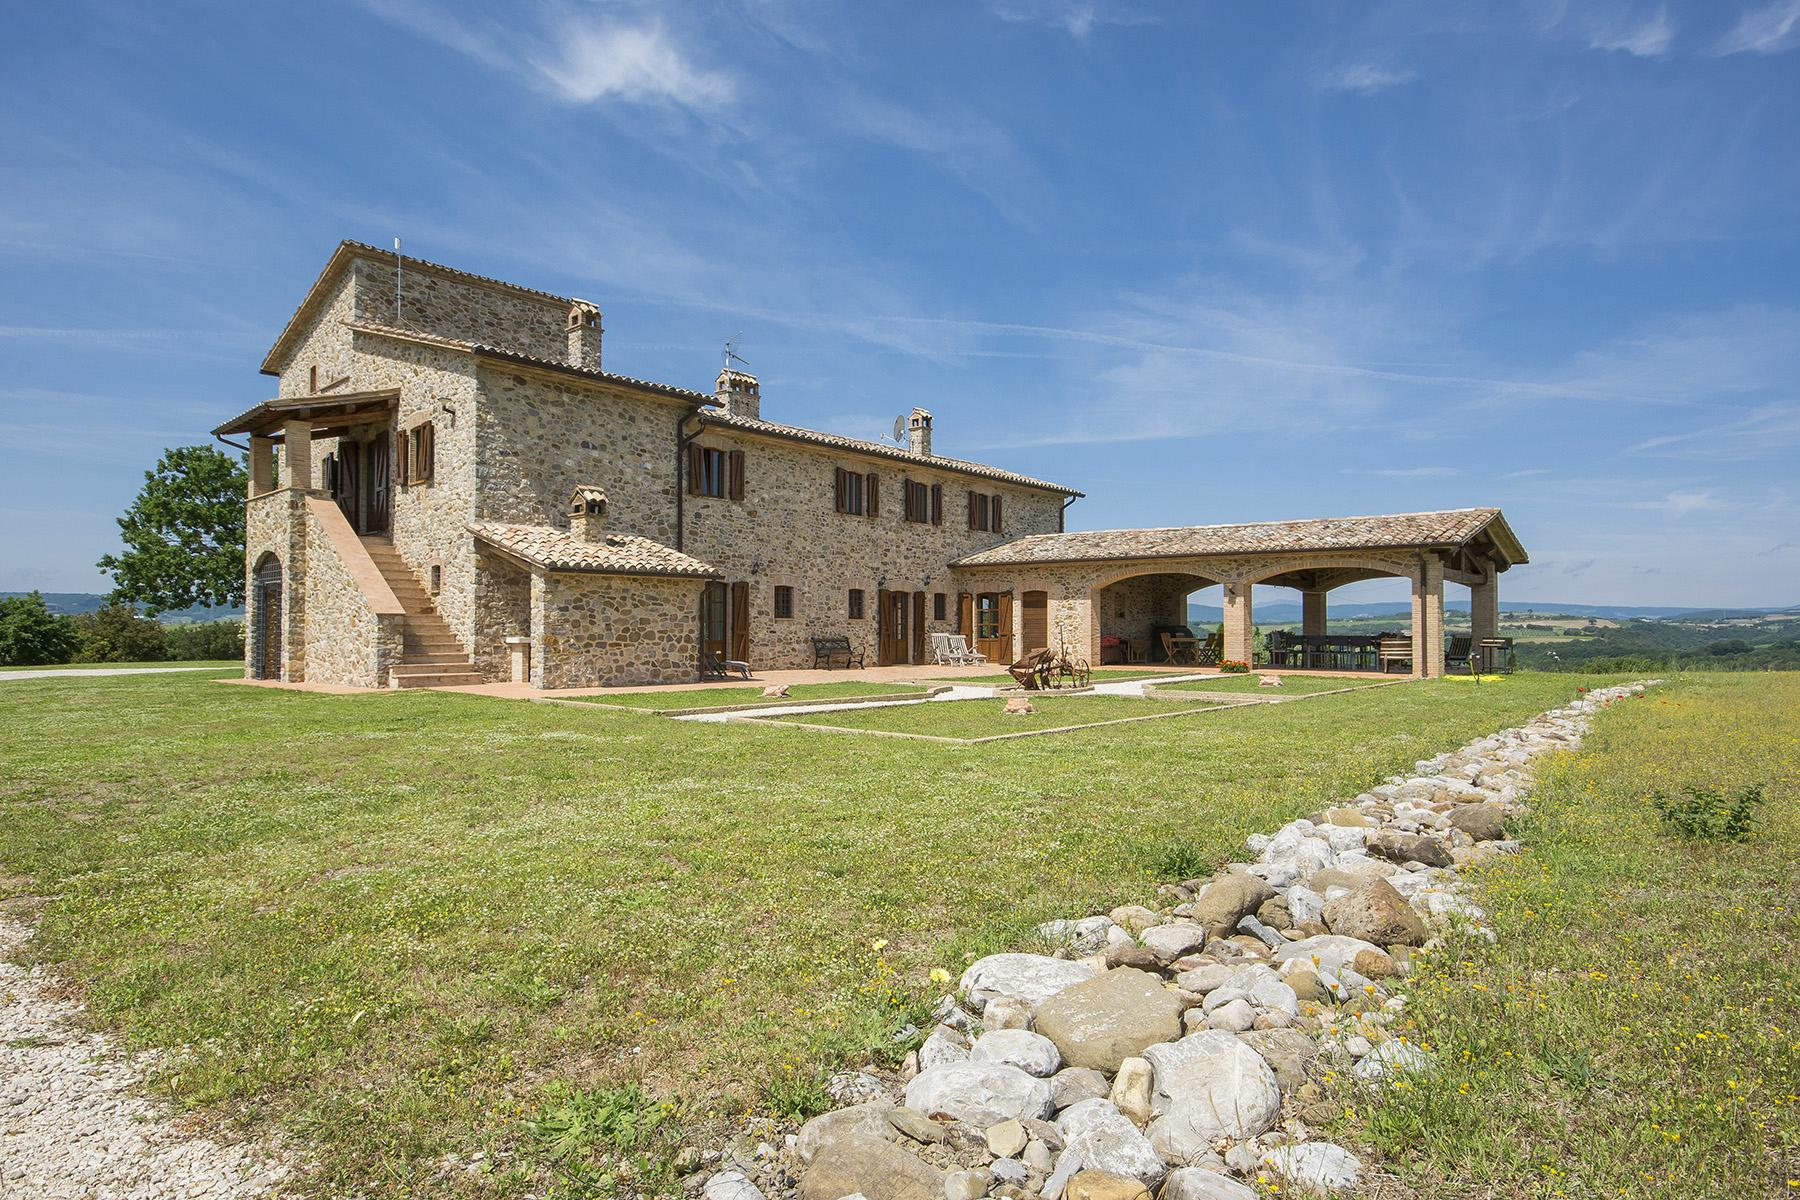 Eccezionale proprietà tra Toscana e Umbria - 4